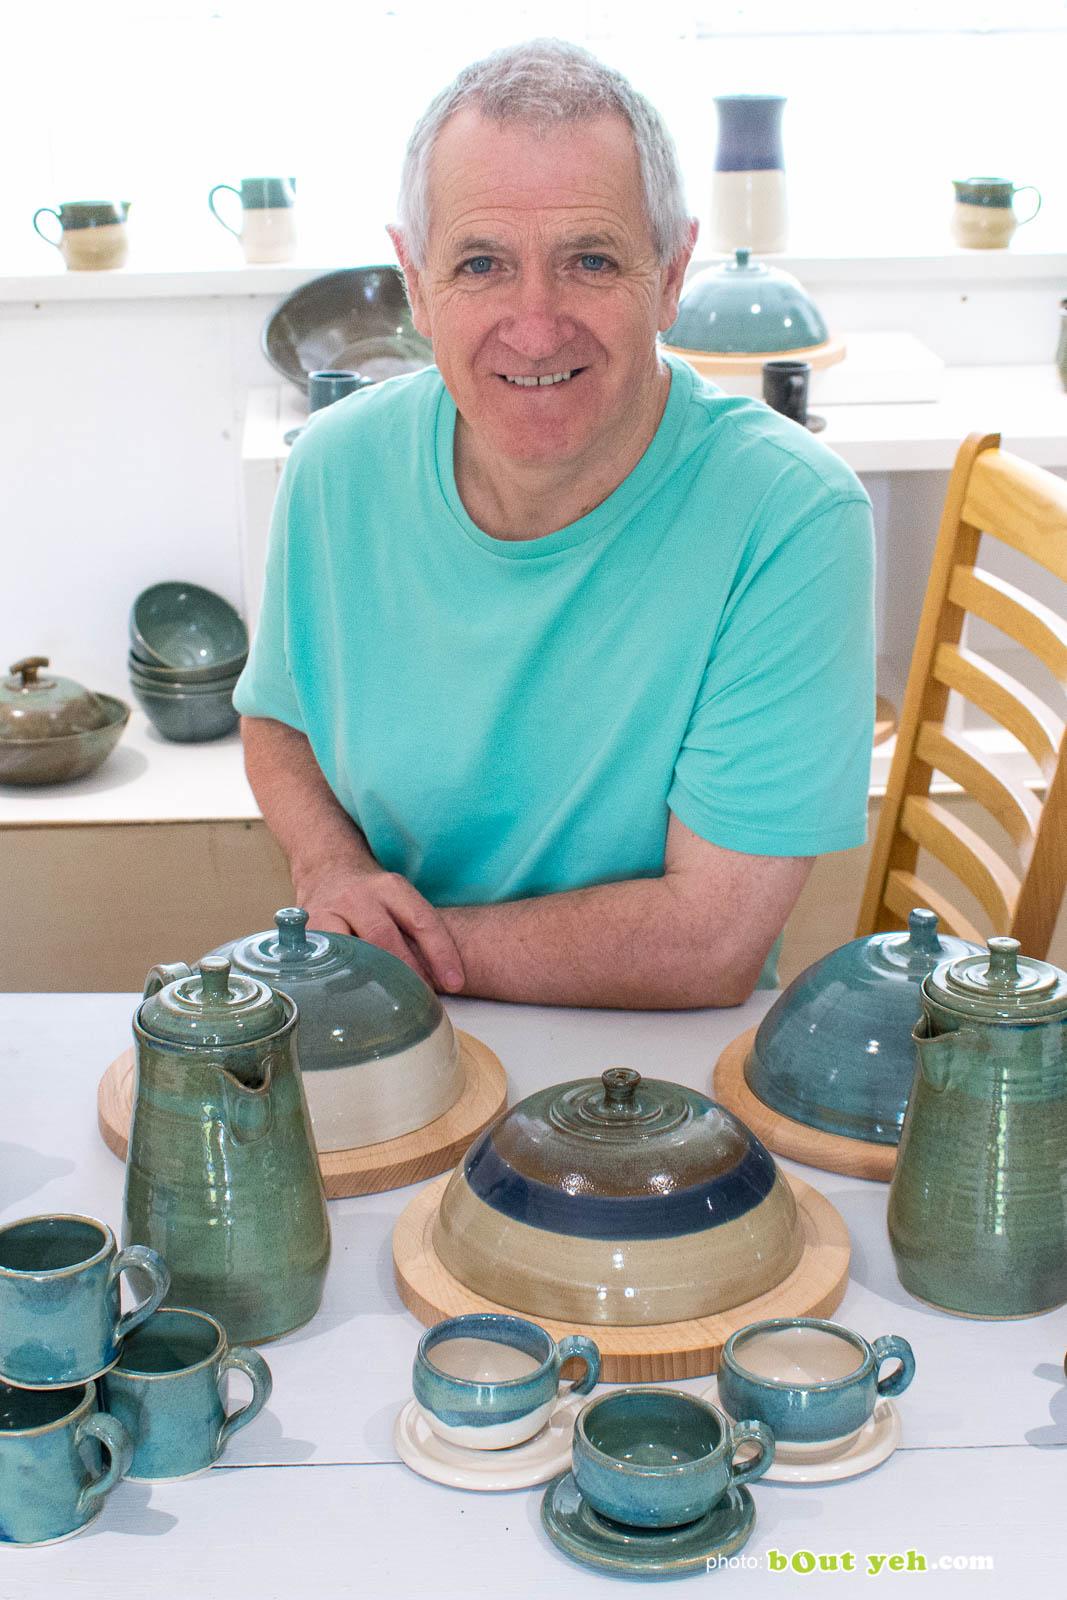 Photograph of potter Ciaran Headley in his studio in Crumlin, Northern Ireland. Photo 1500